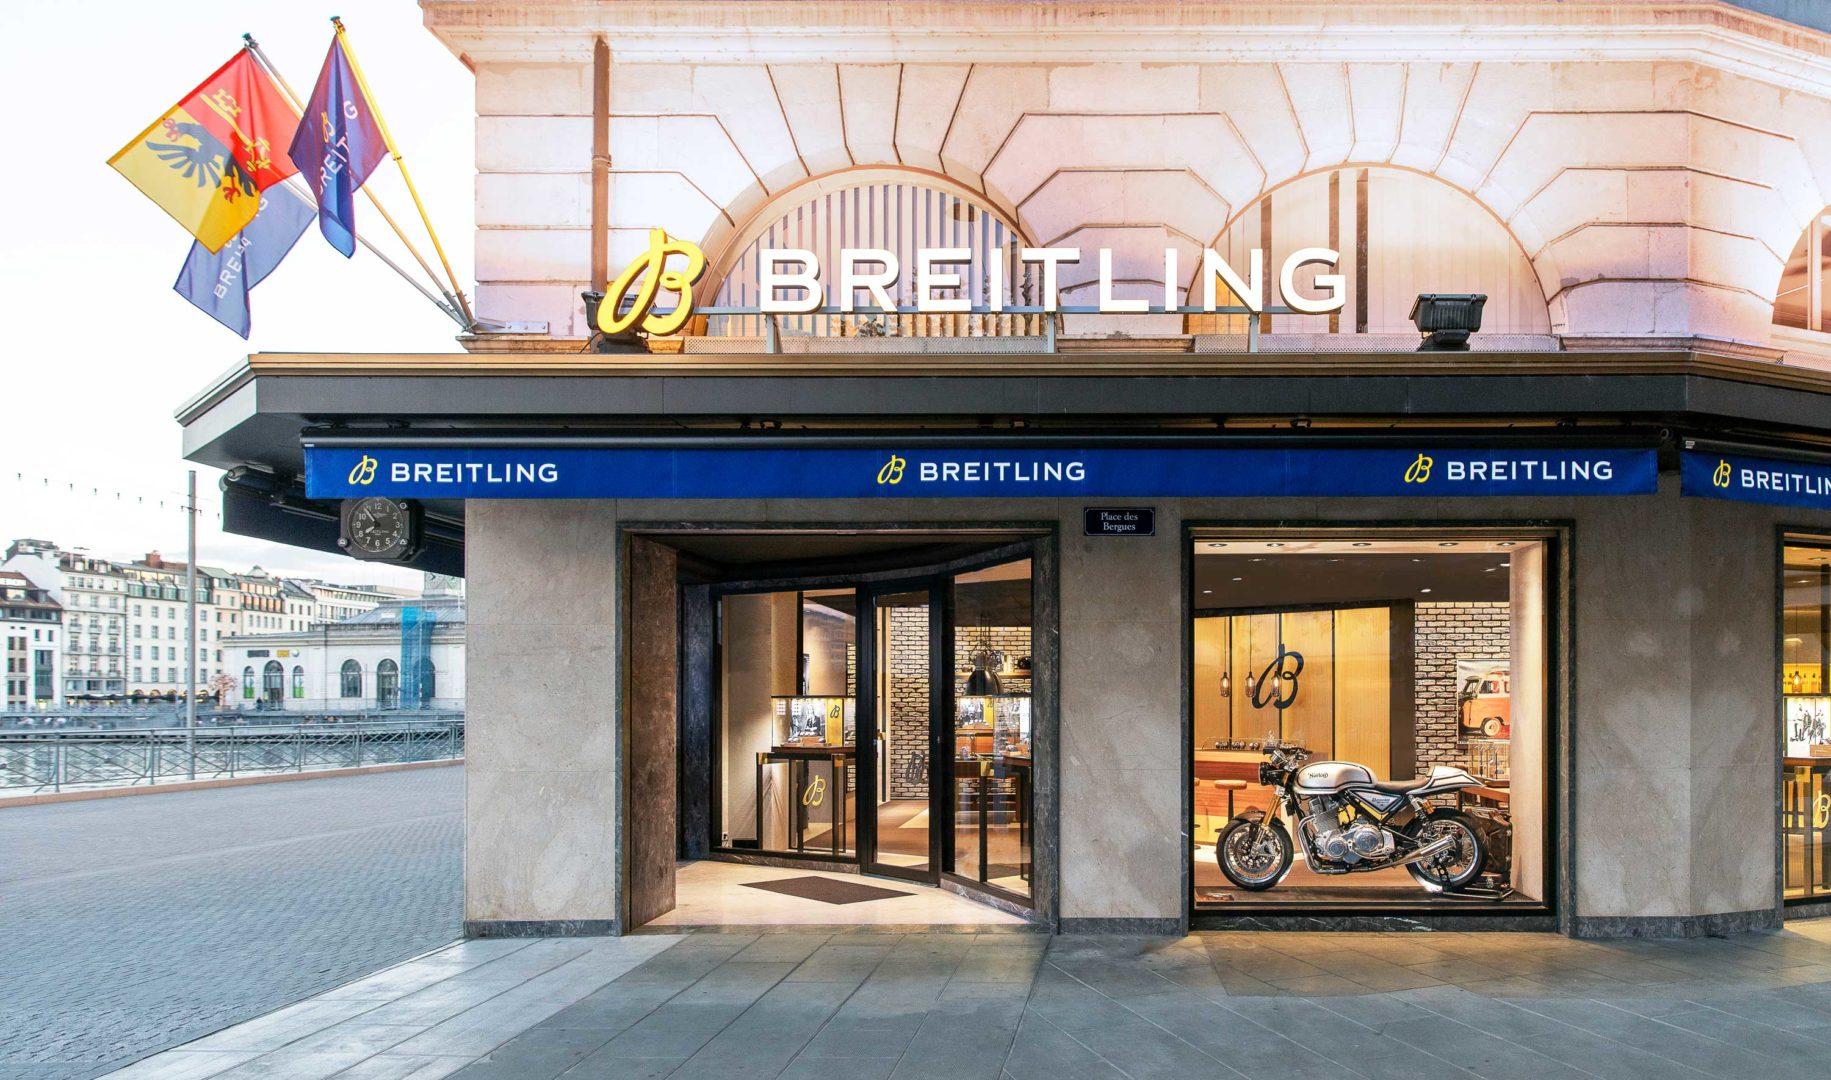 Boutique Breitling